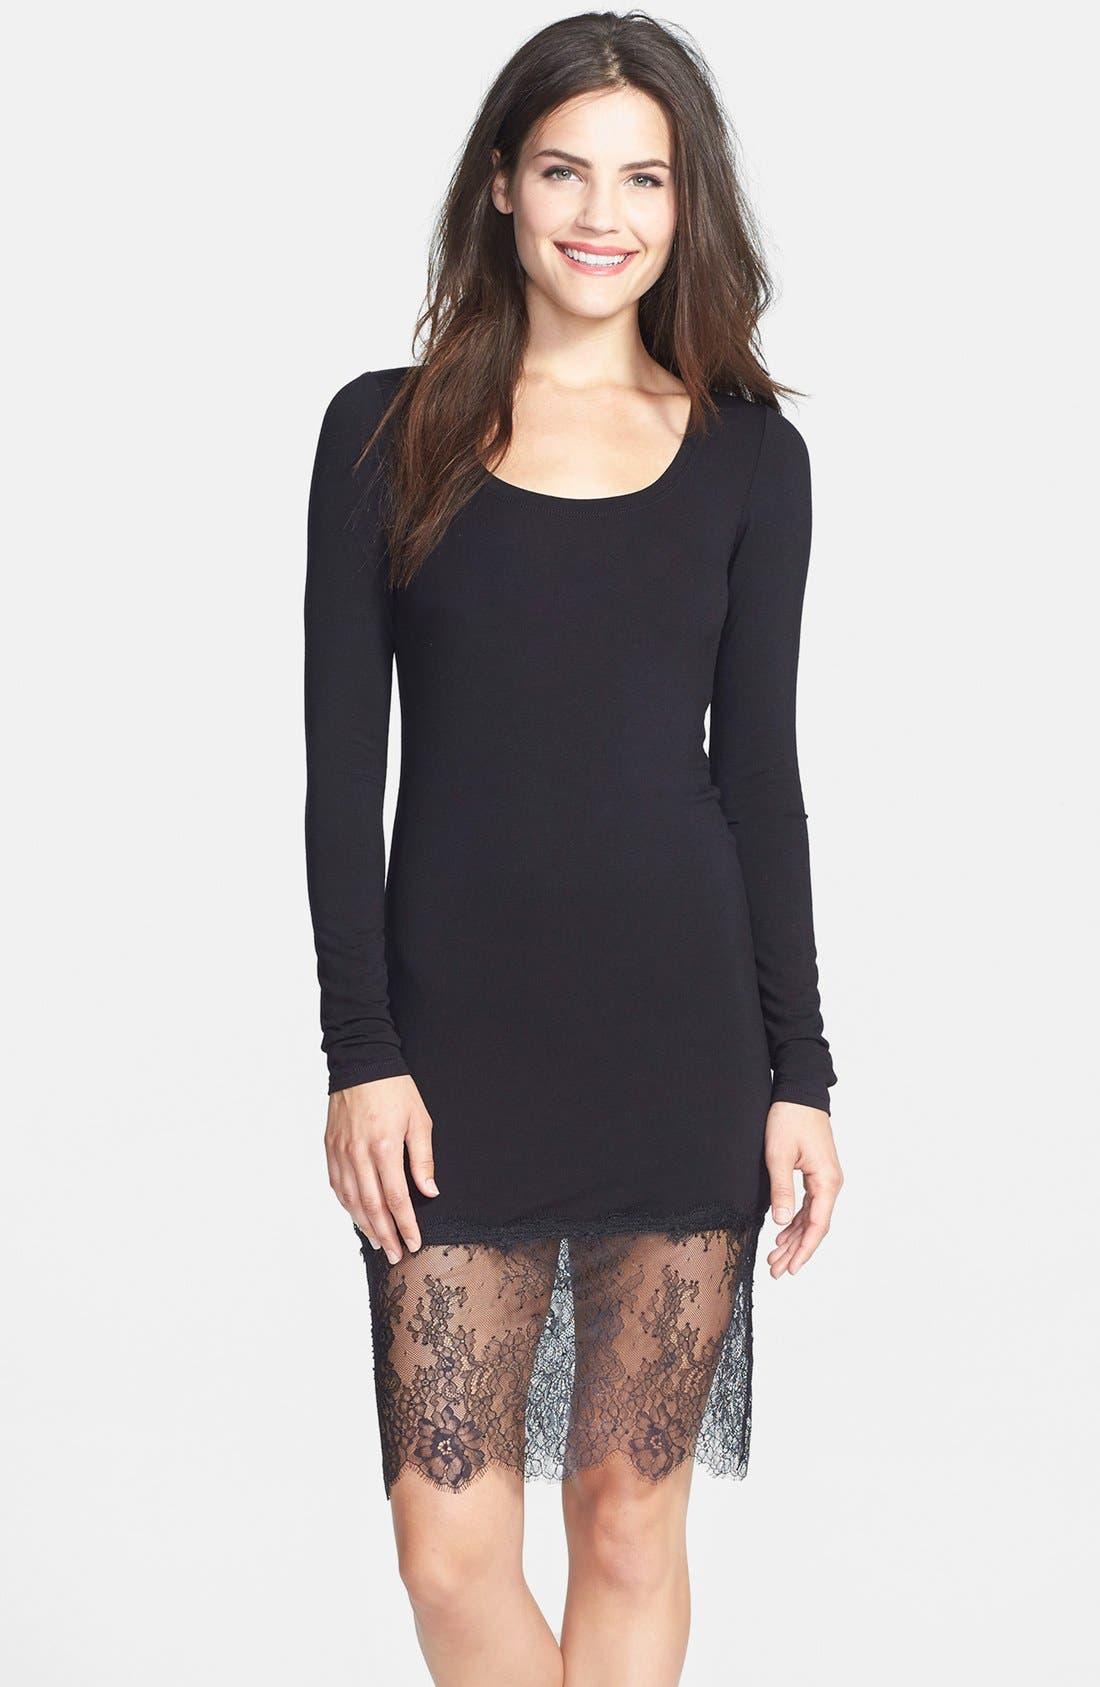 BCBGMAXAZRIA, 'Livi' Lace & Jersey Knit Sheath Dress, Main thumbnail 1, color, 001